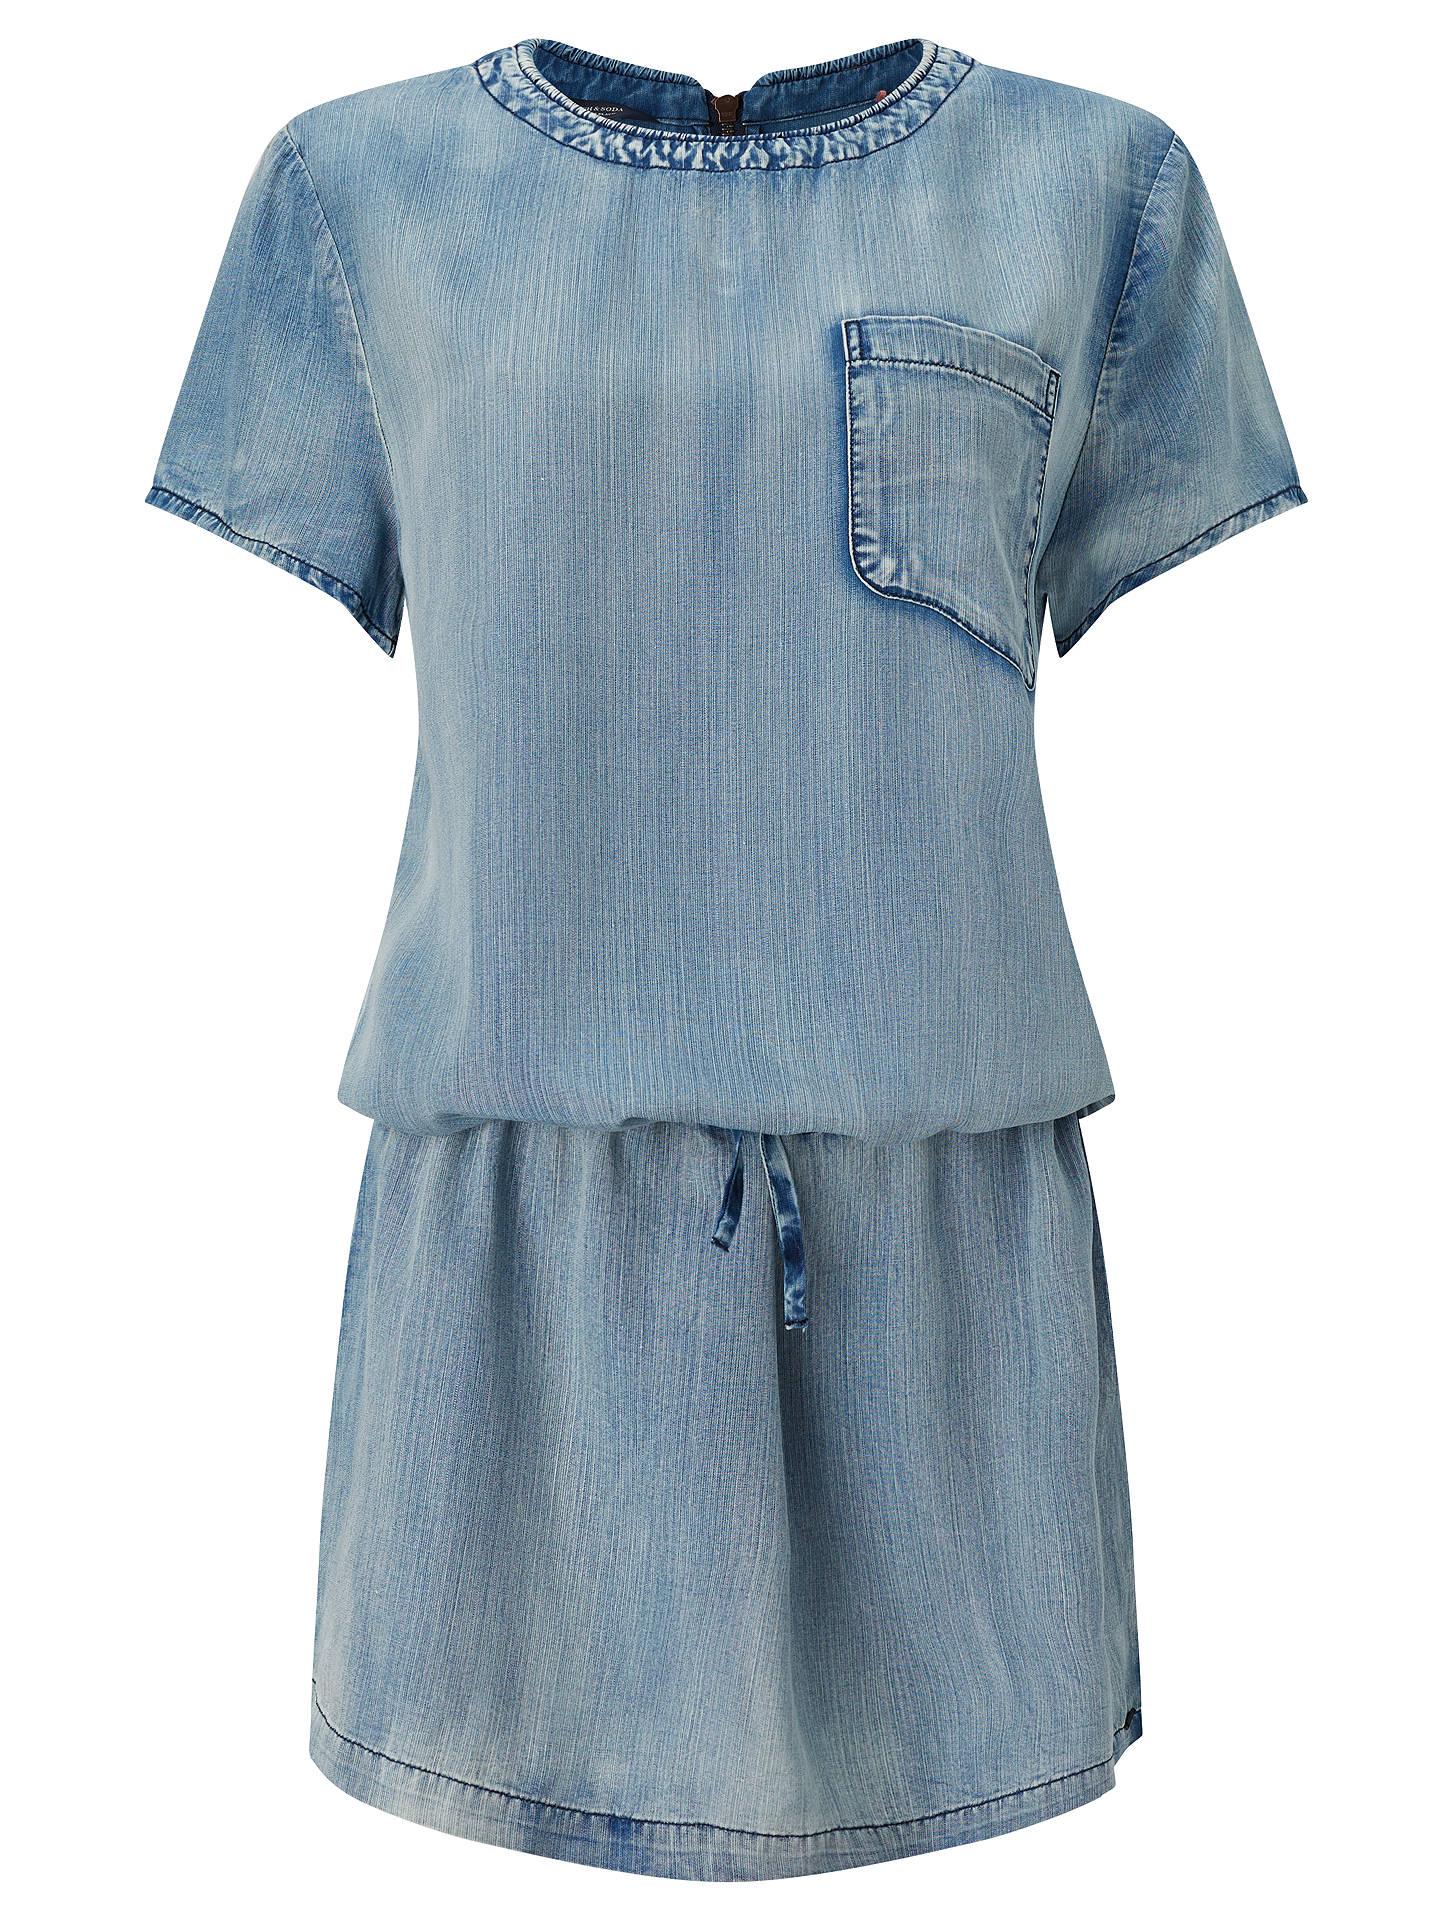 570e483124 Buy Maison Scotch Drop Waist Denim Dress